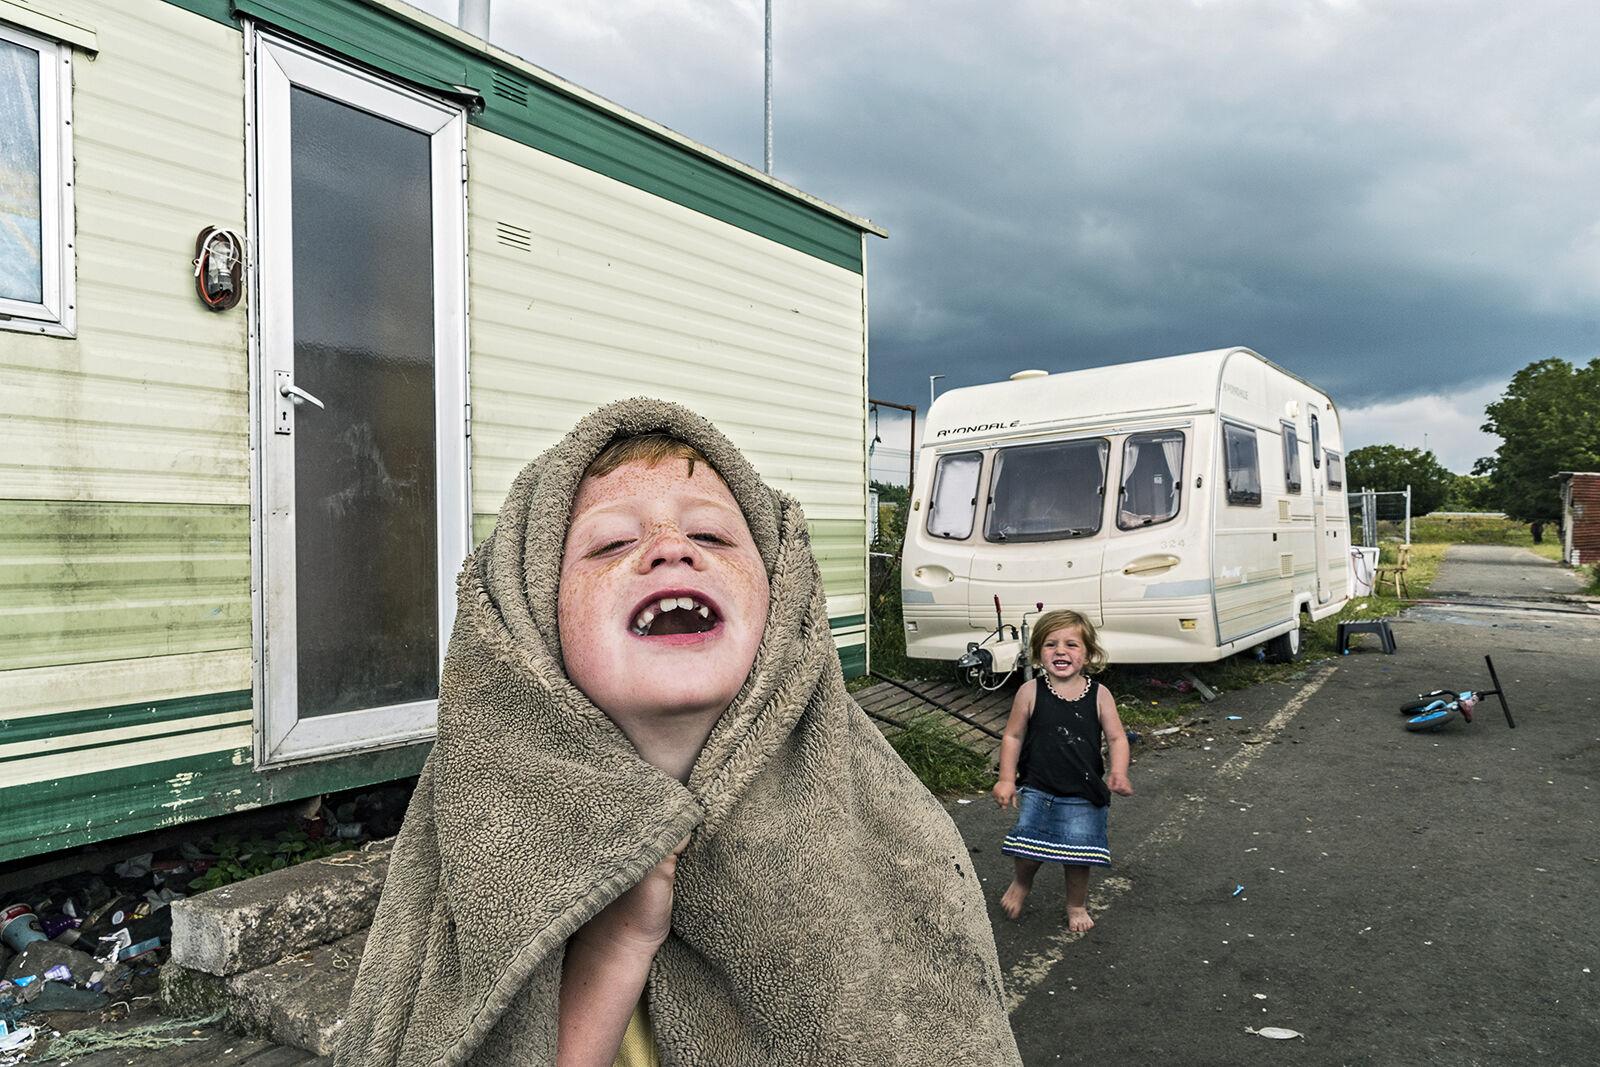 Daniel Missing Teeth, Tipperary, Ireland 2019